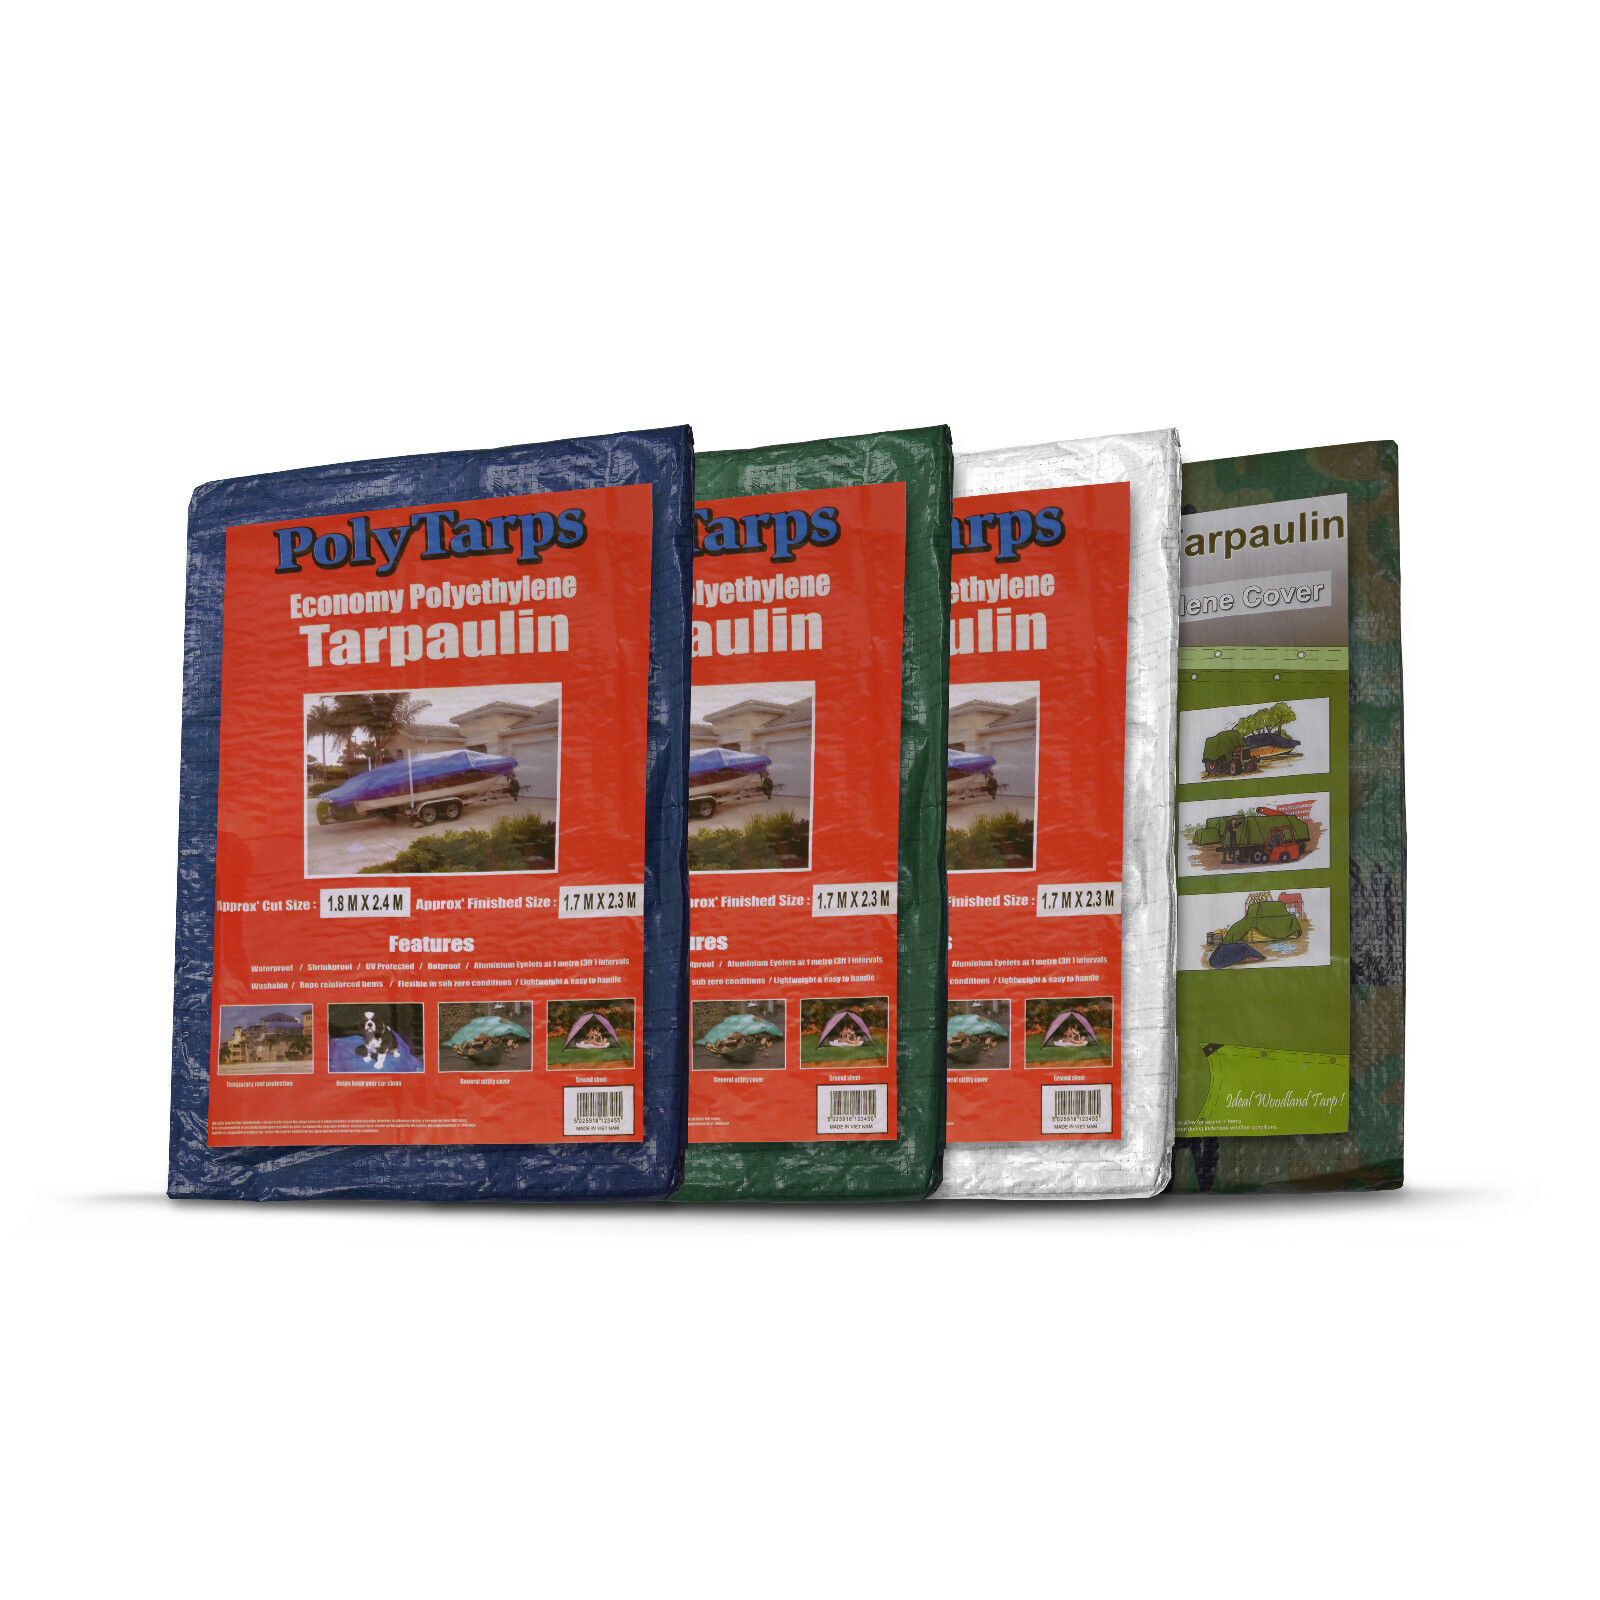 Waterproof Tarpaulin Ground Sheet Lightweight Camping Cover Tarp with Eyelets - 2